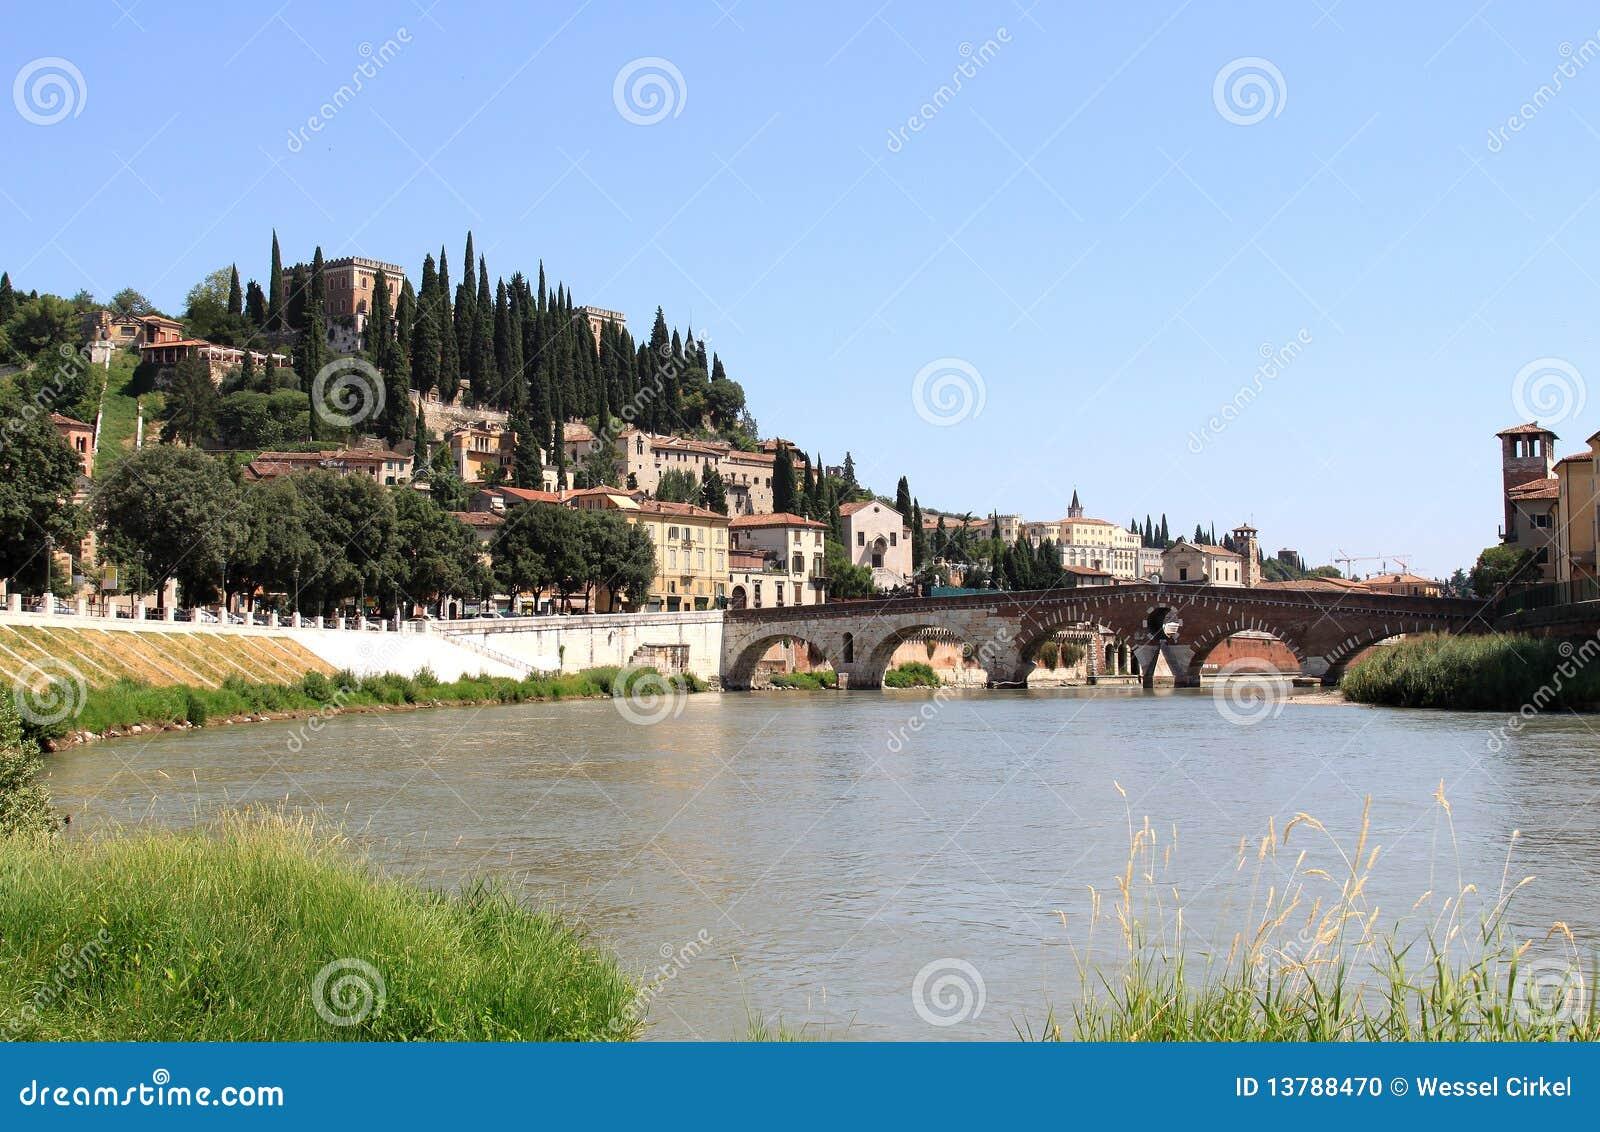 Roman Ponte Pietra over the Adige River, Verona